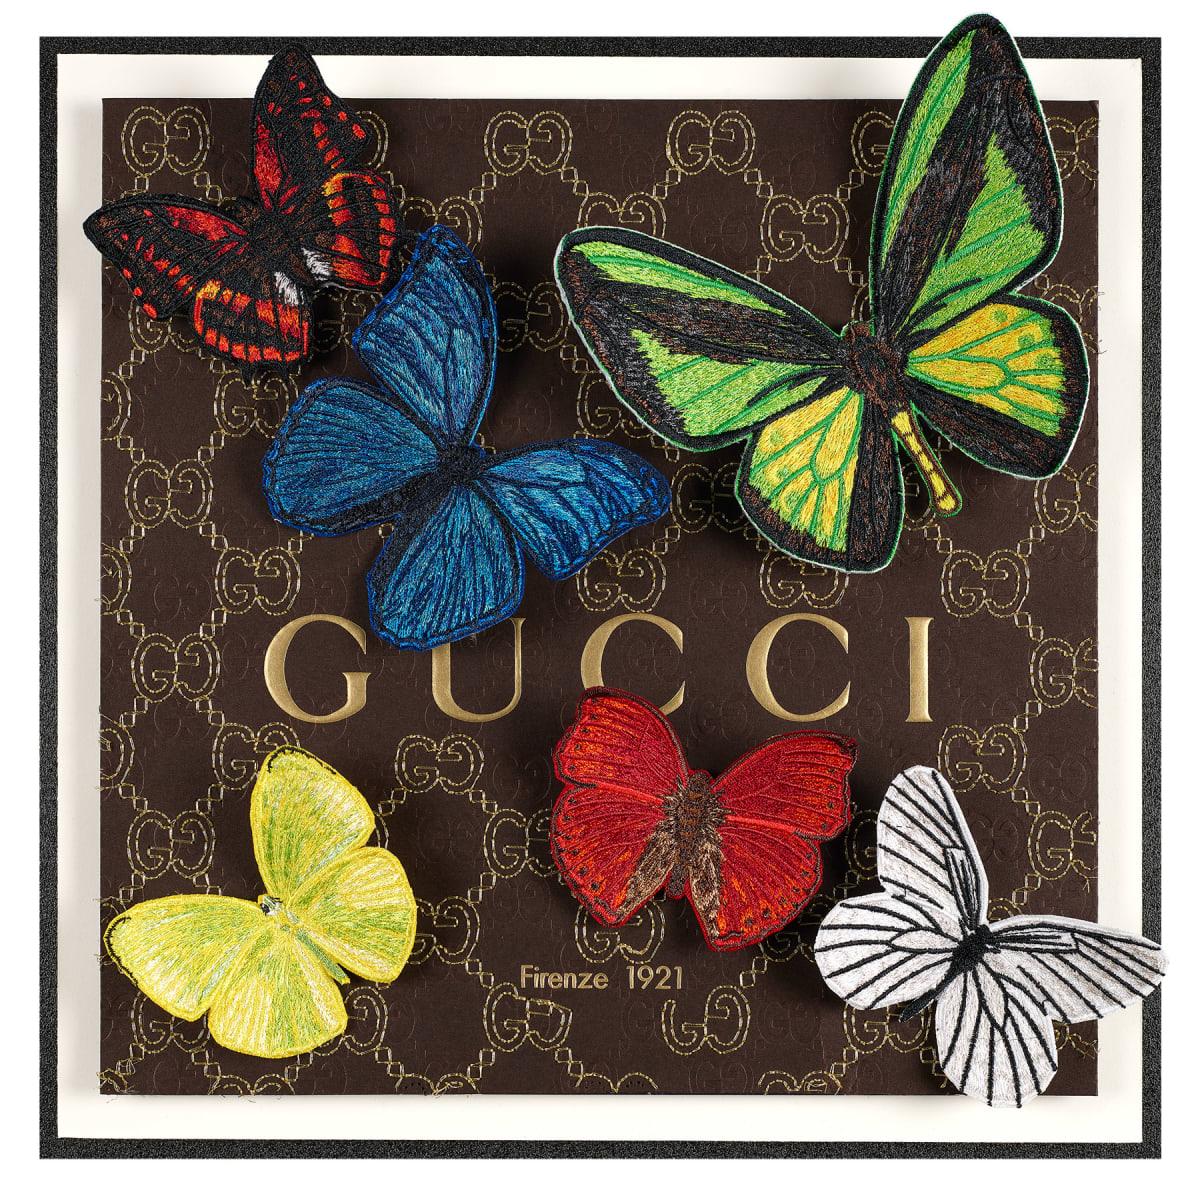 Stephen Wilson, Gucci Gathering IV, 2020